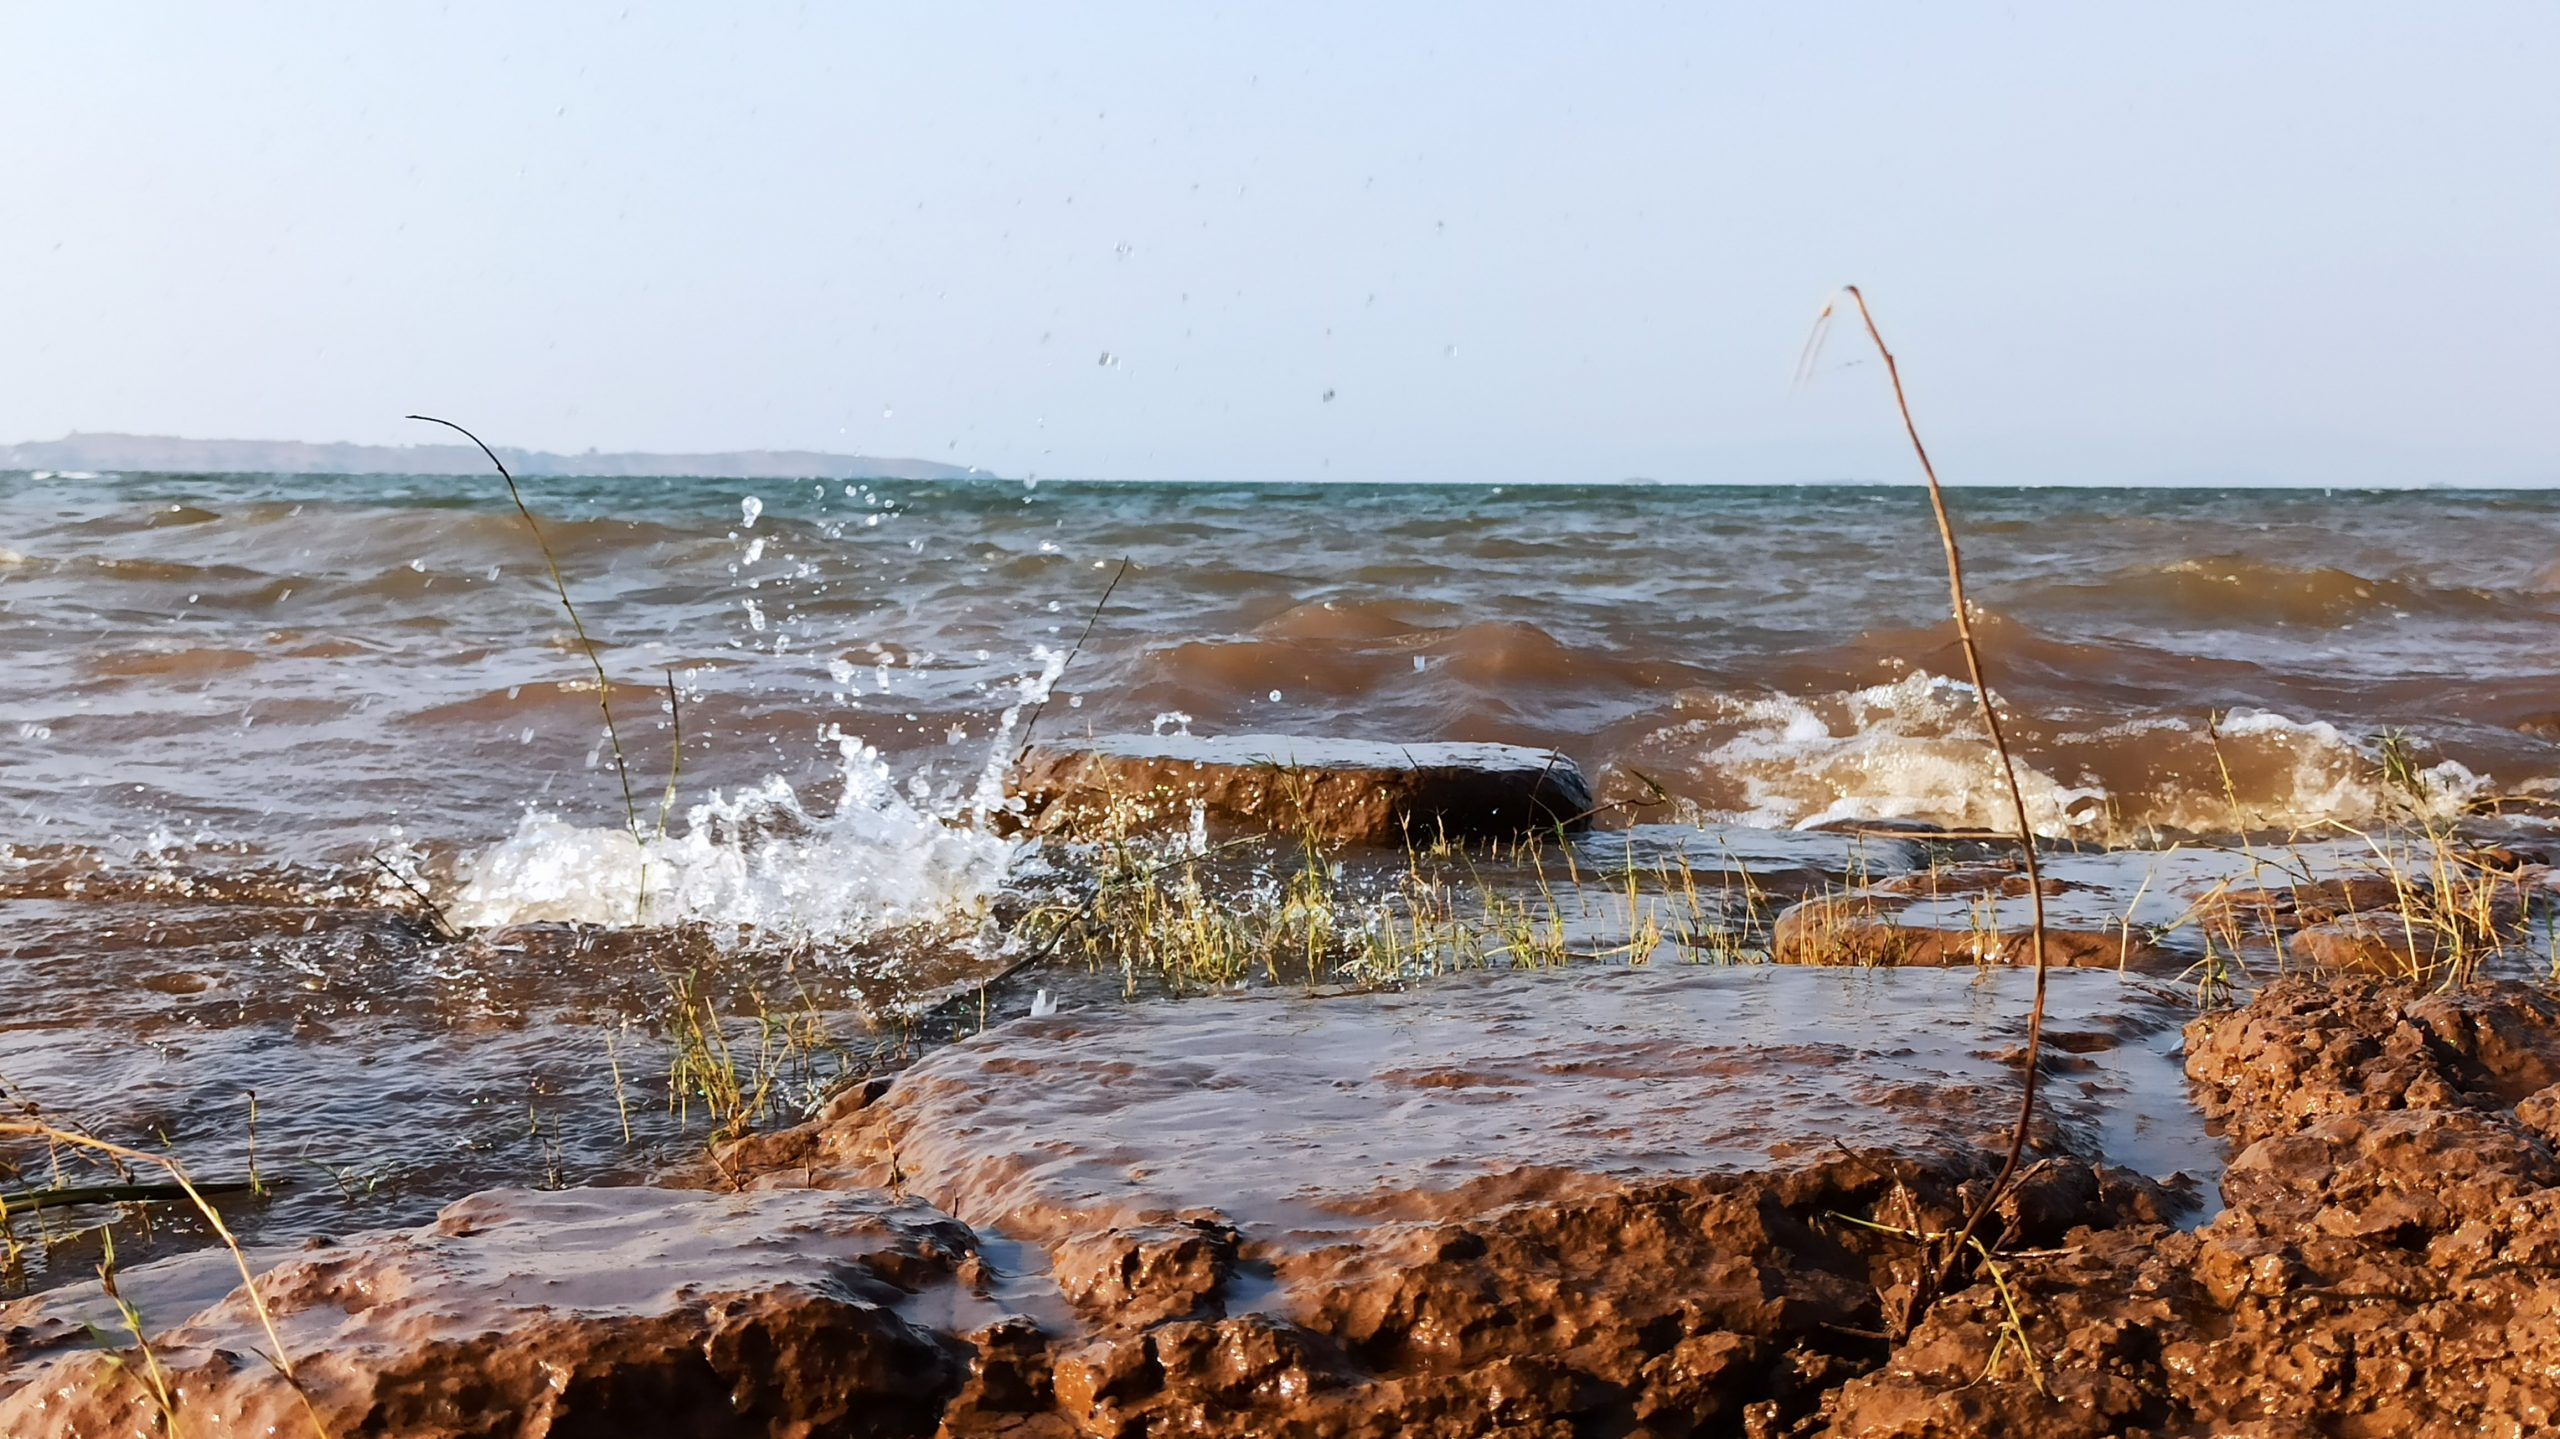 waves splashing against rocks